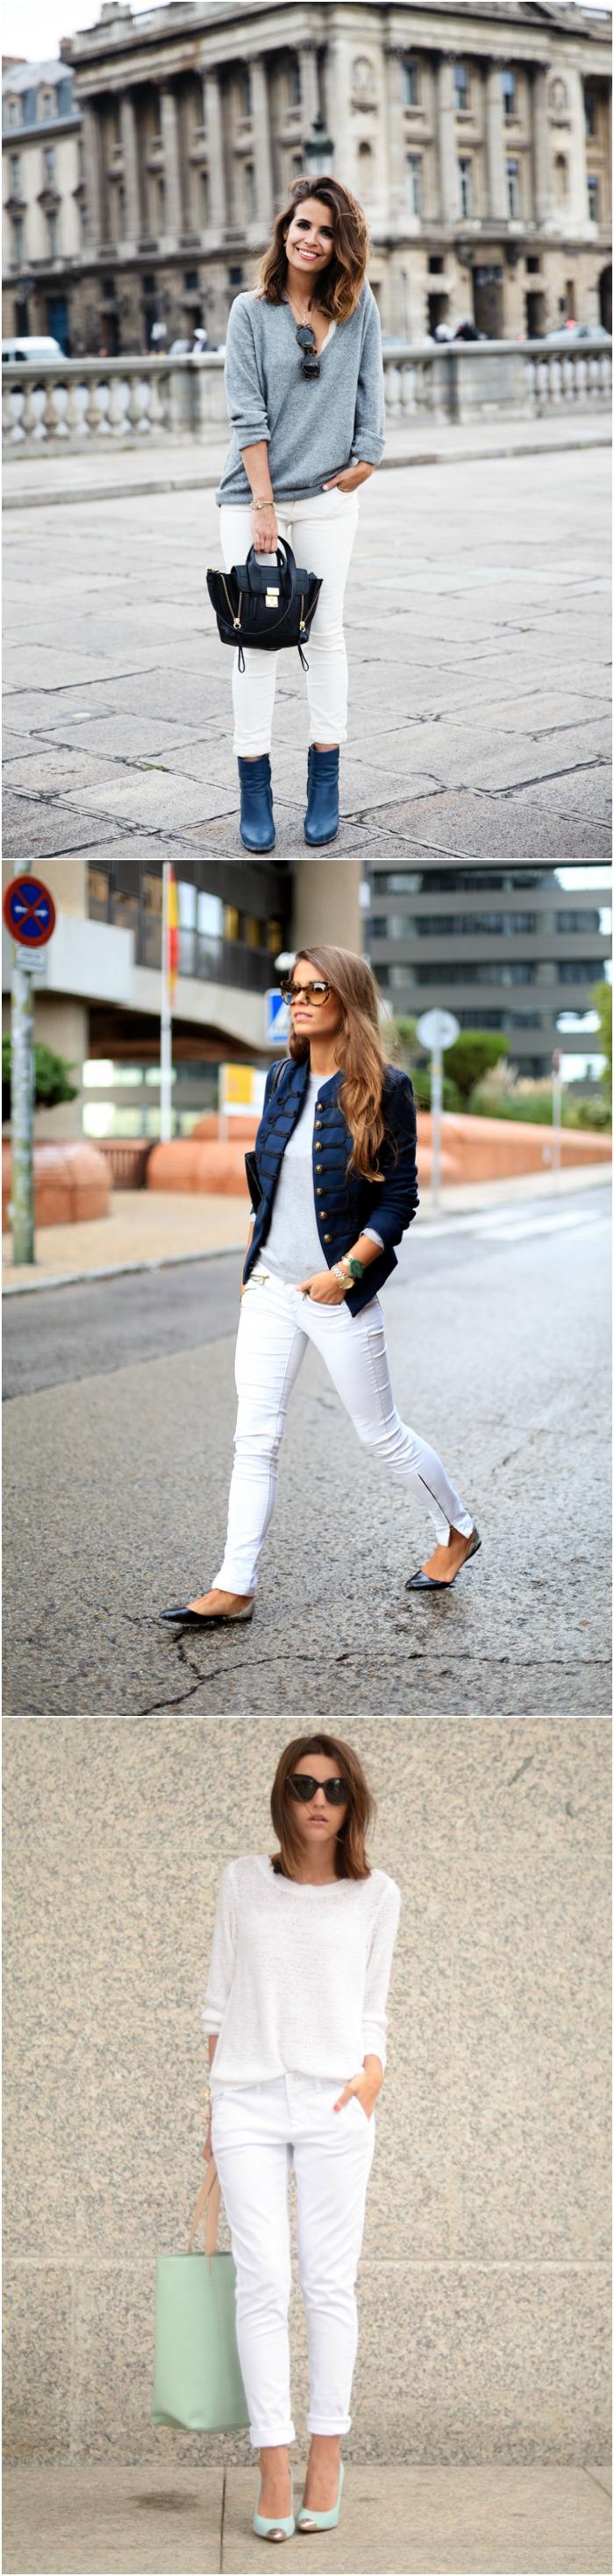 pantalones blancos bloggers